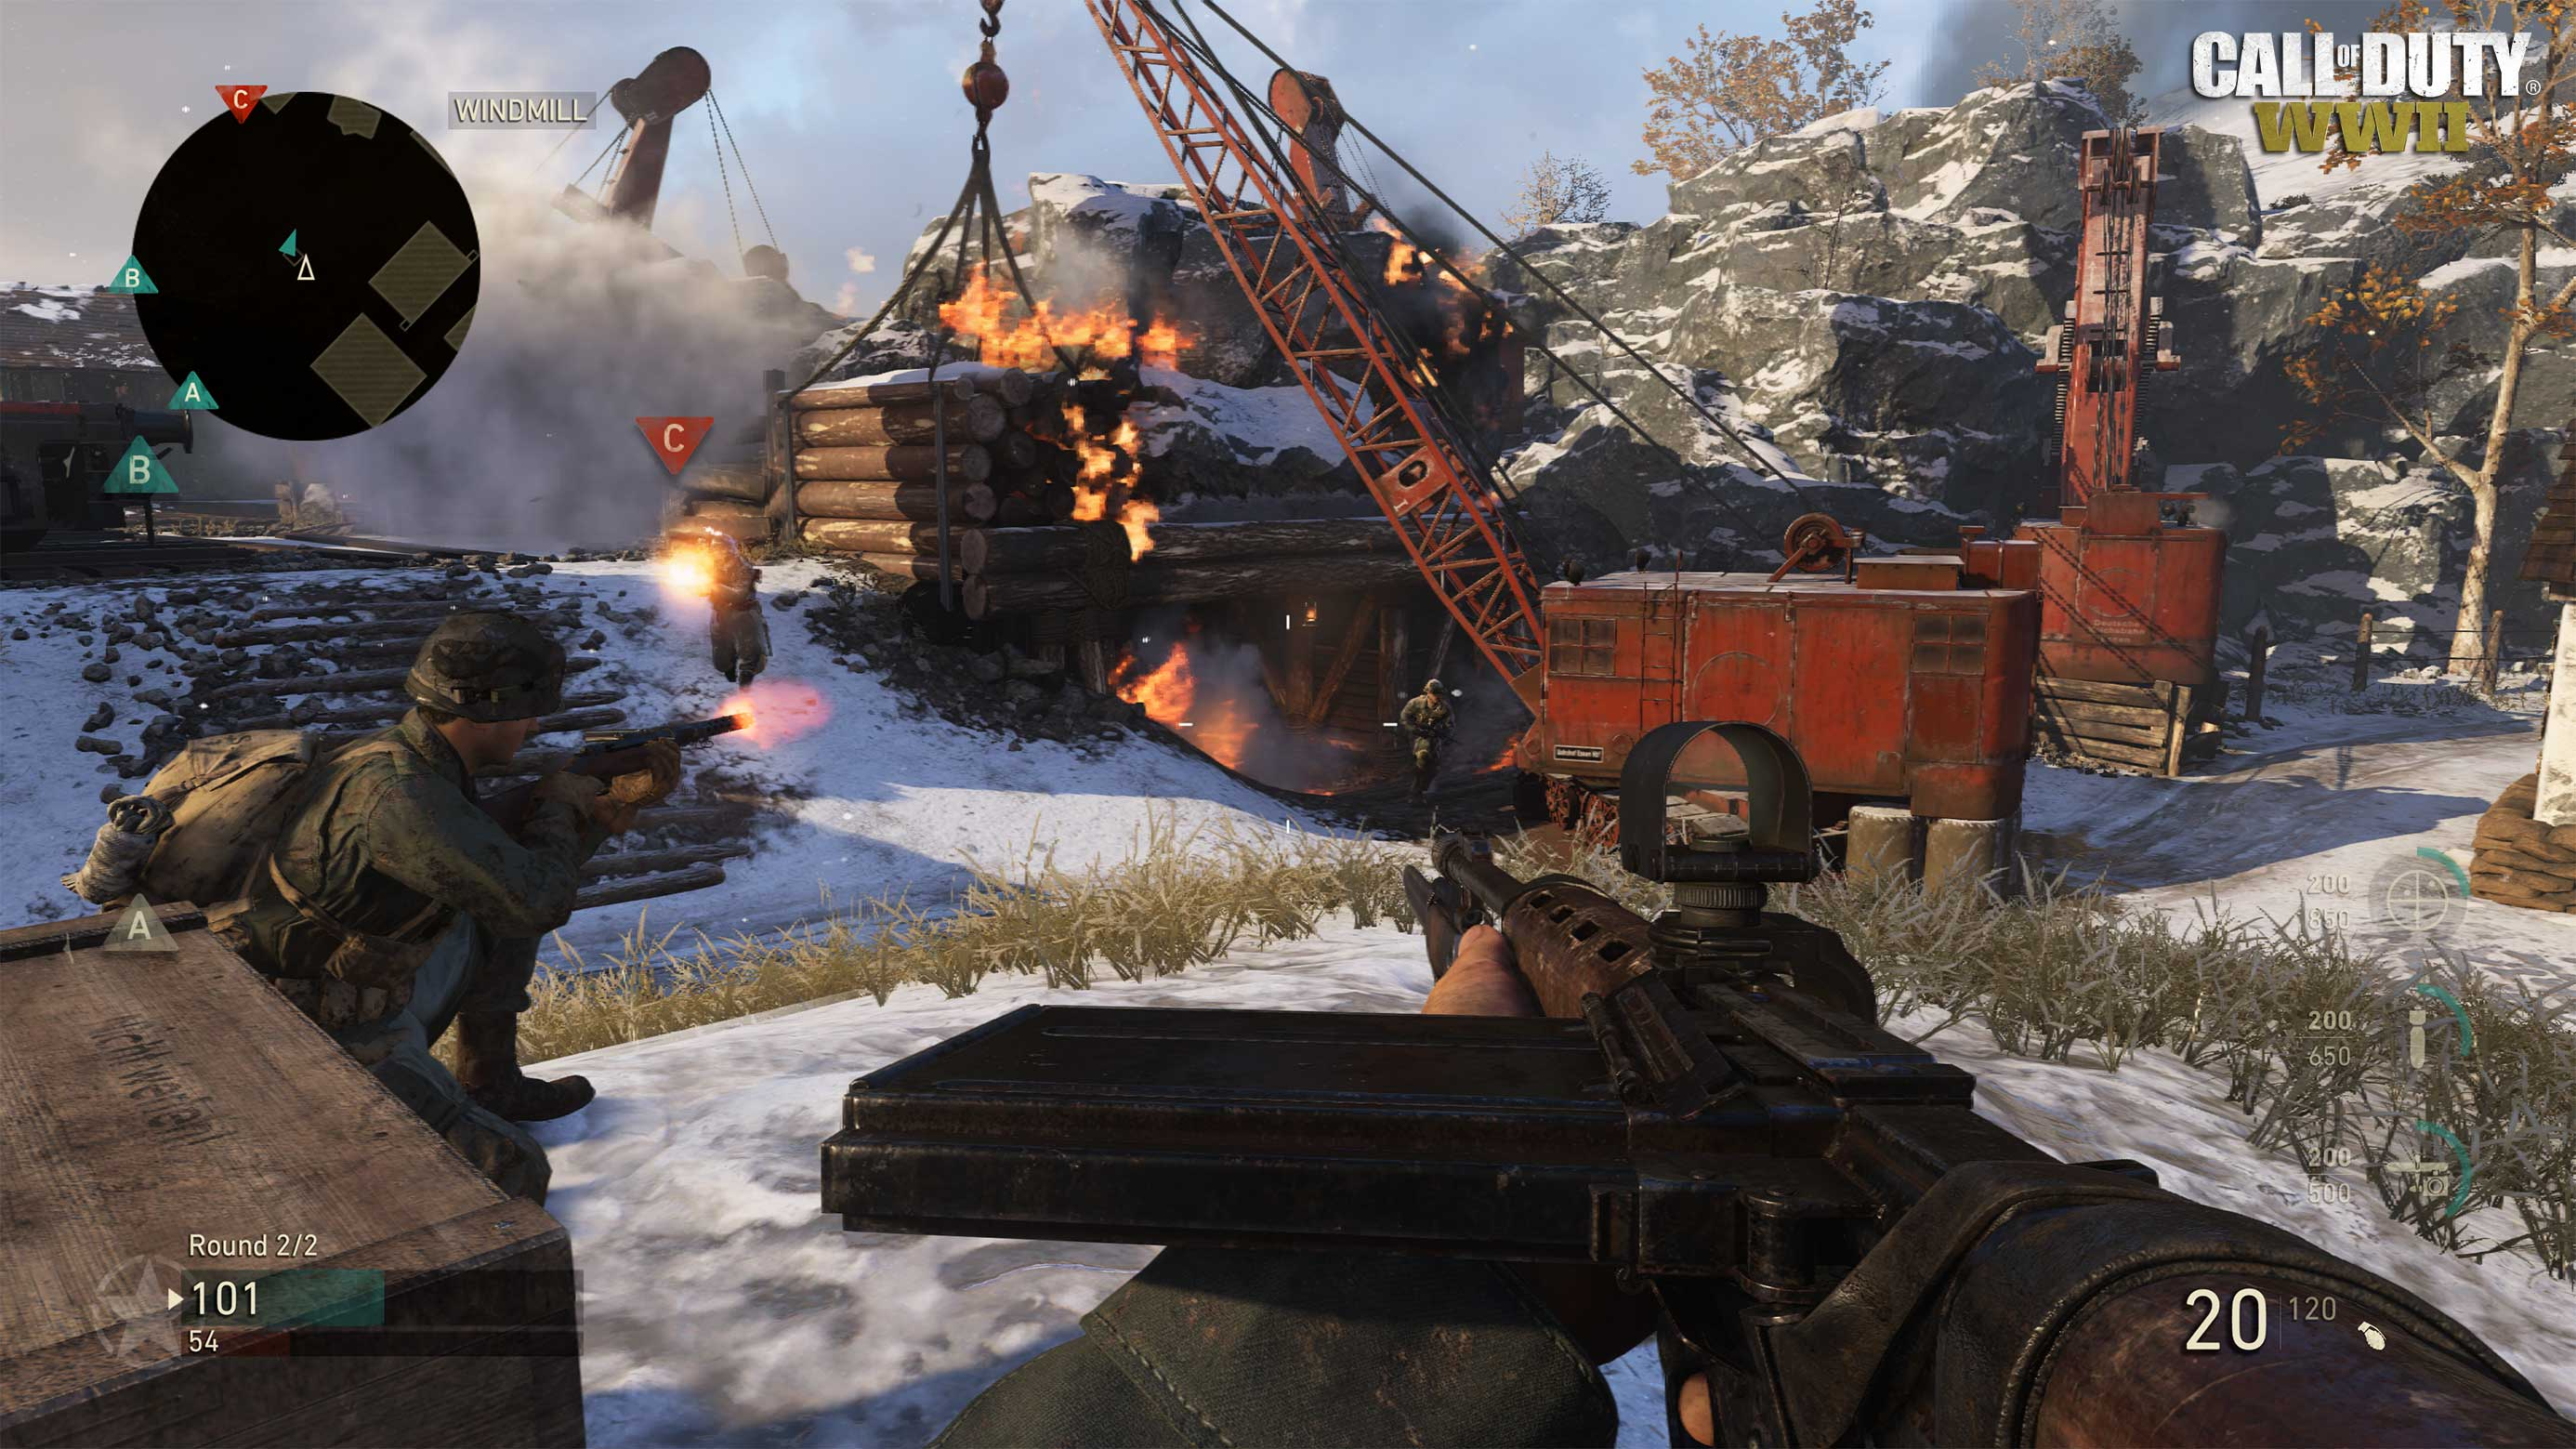 Call of Duty World War II screenshot